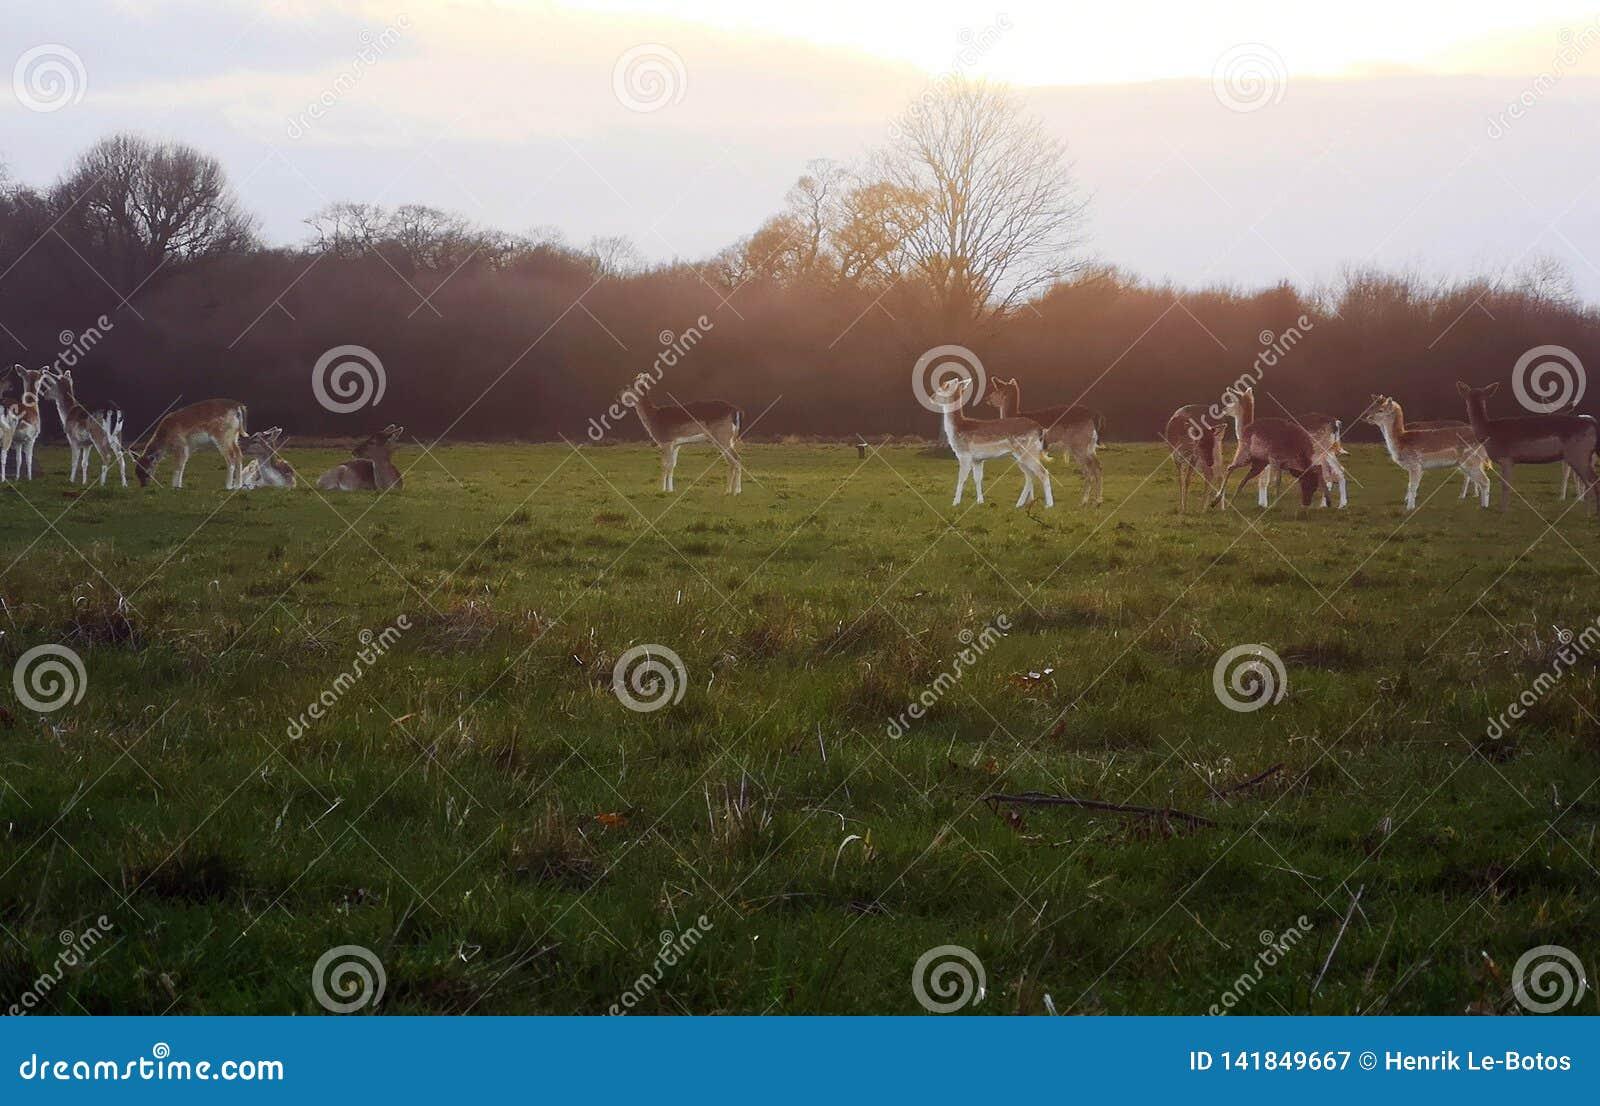 Observação de Richmond Park Deer